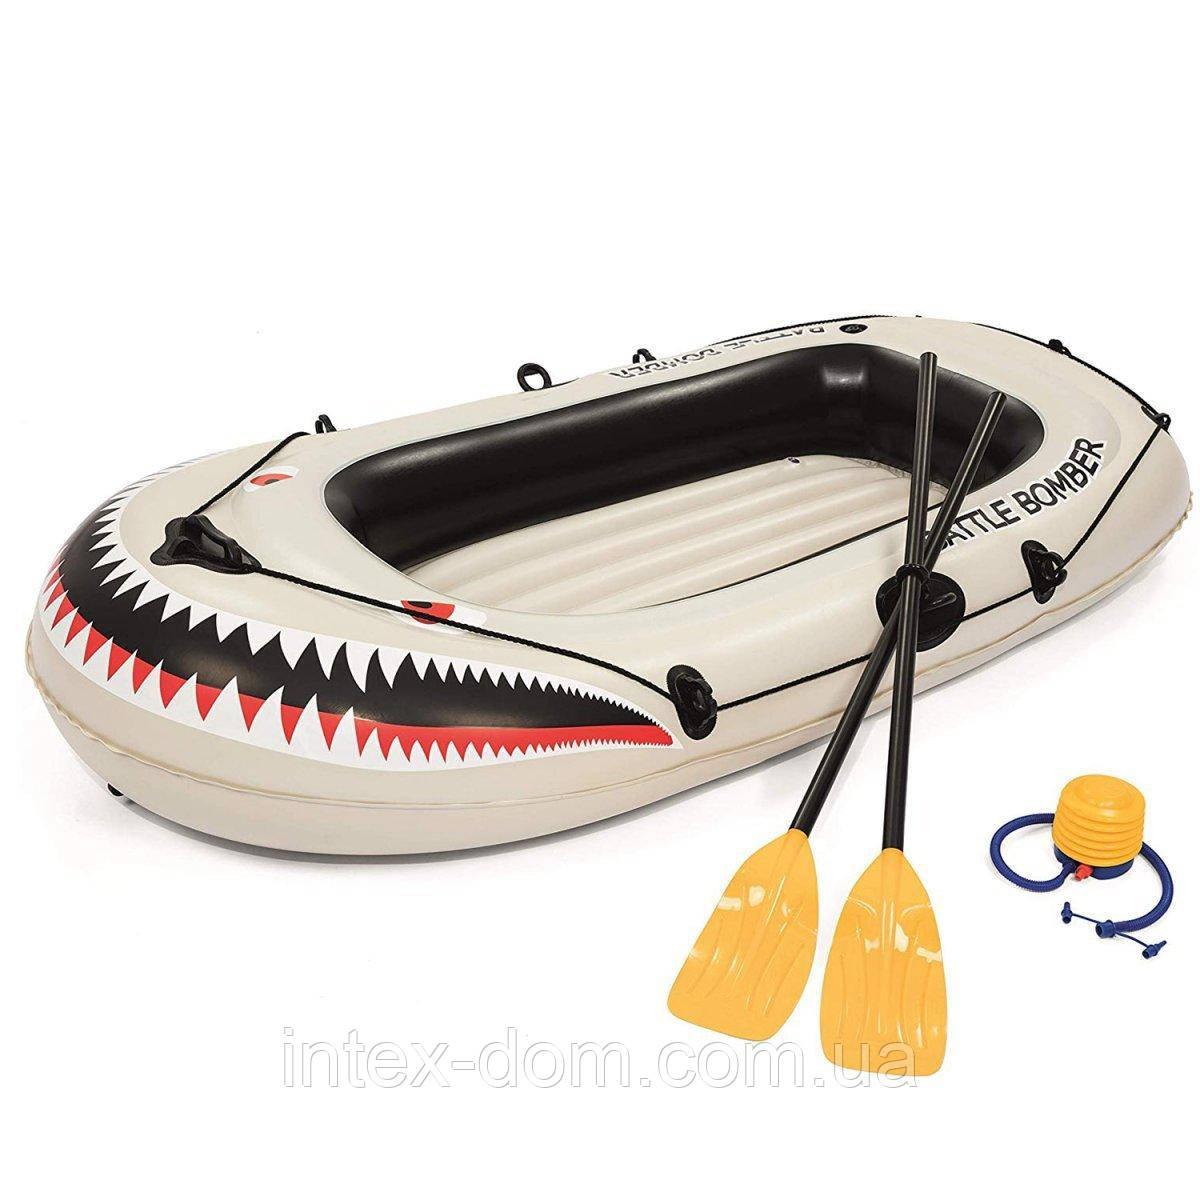 Полутораместная надувная лодка Bestway 61108